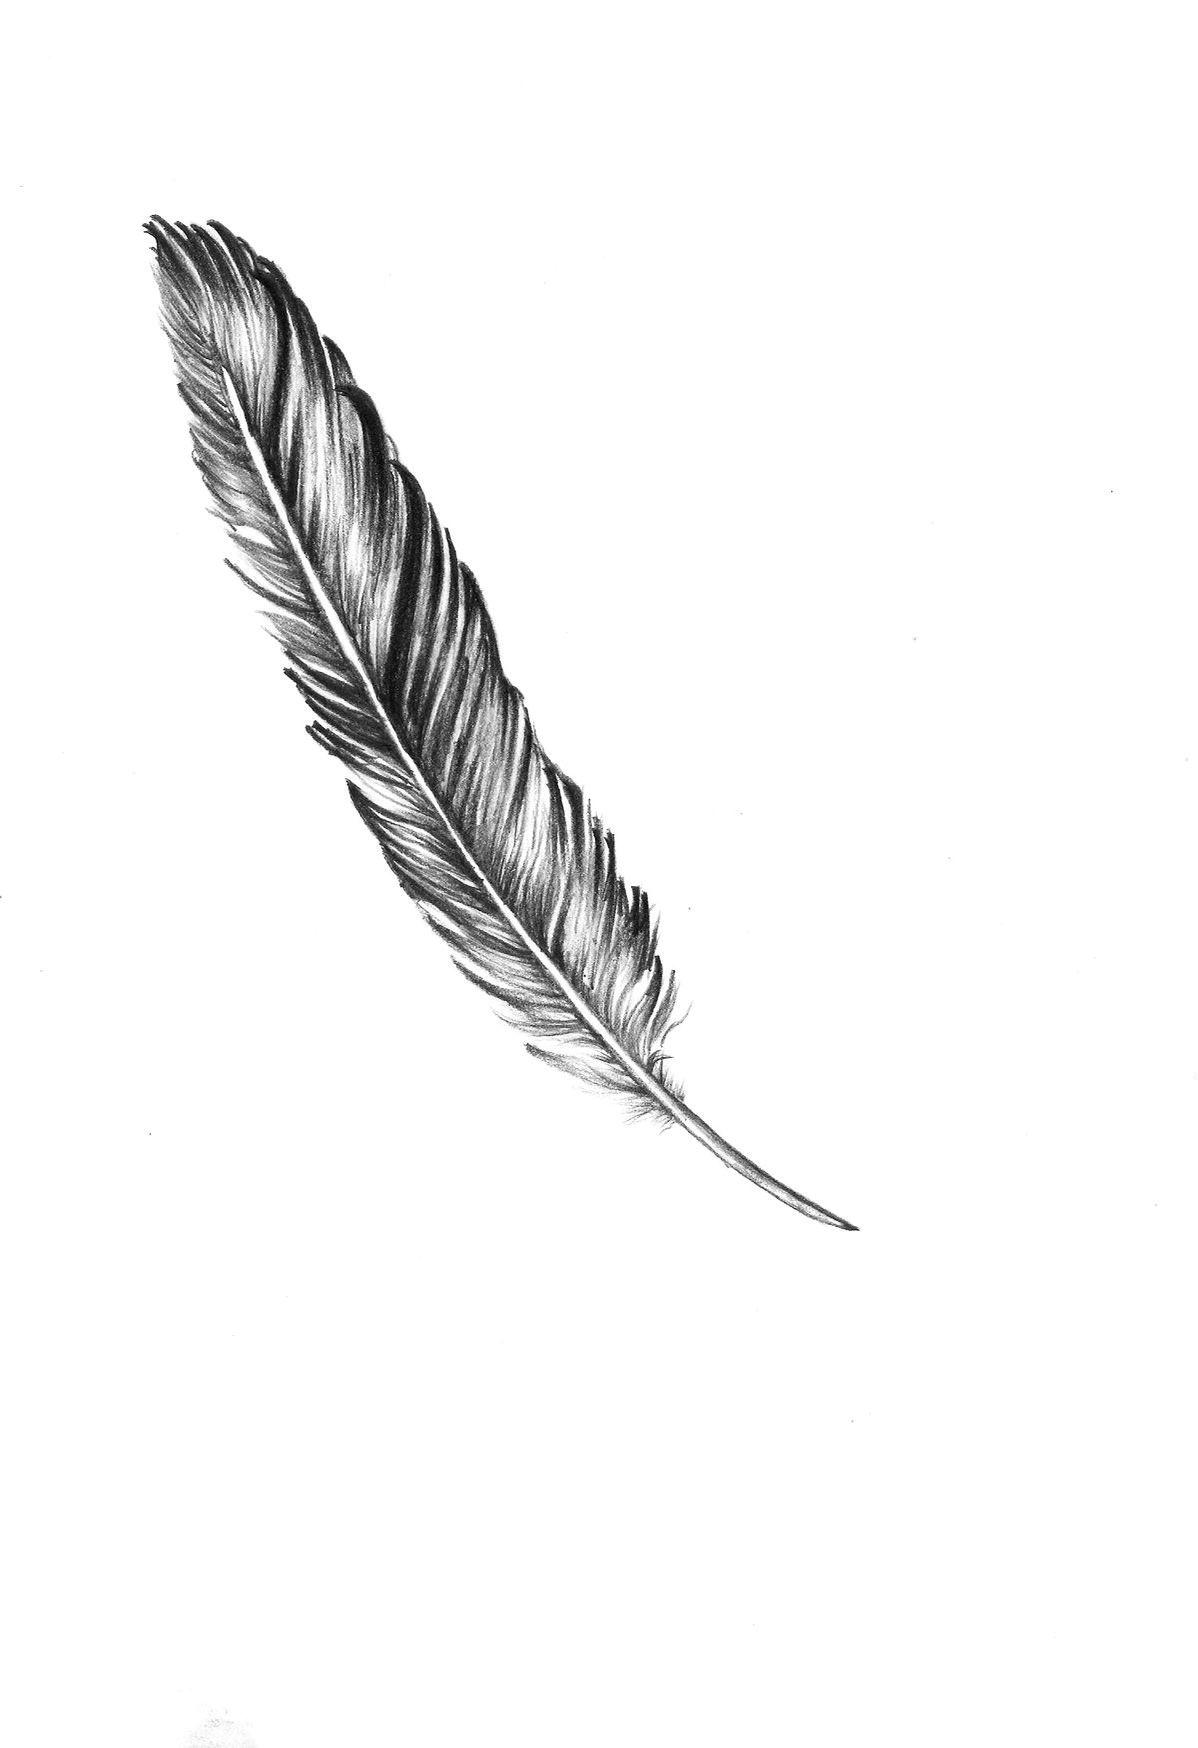 Quill Tattoo Symbolizes Journalism And Writing Tatuagem Pena Tatoo X Tatuagem